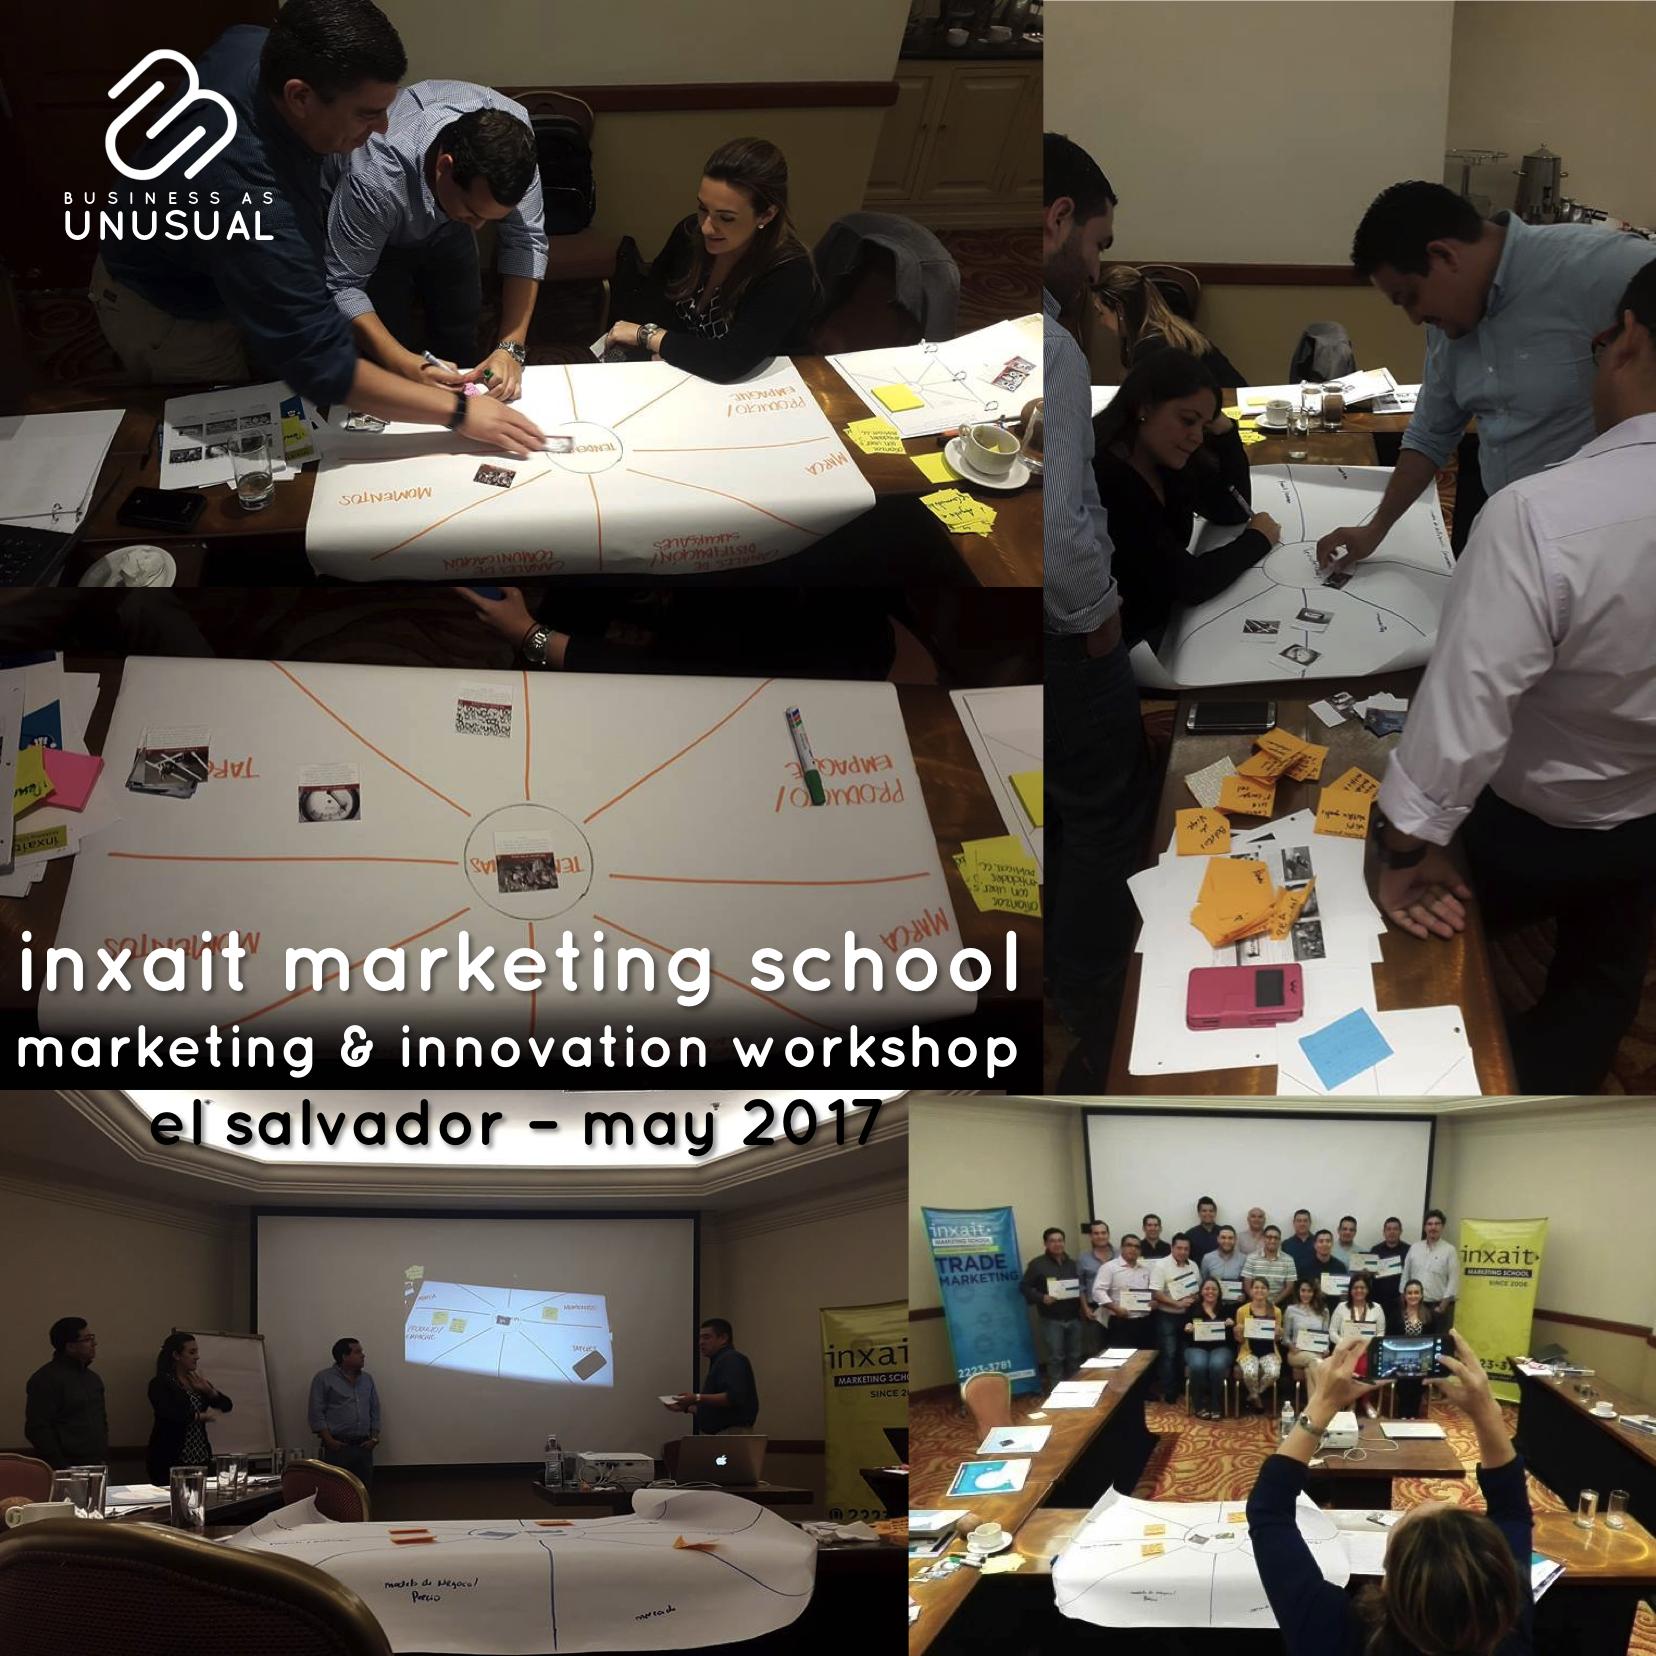 INXAIT Marketing School - Innovation and Marketing Workshop